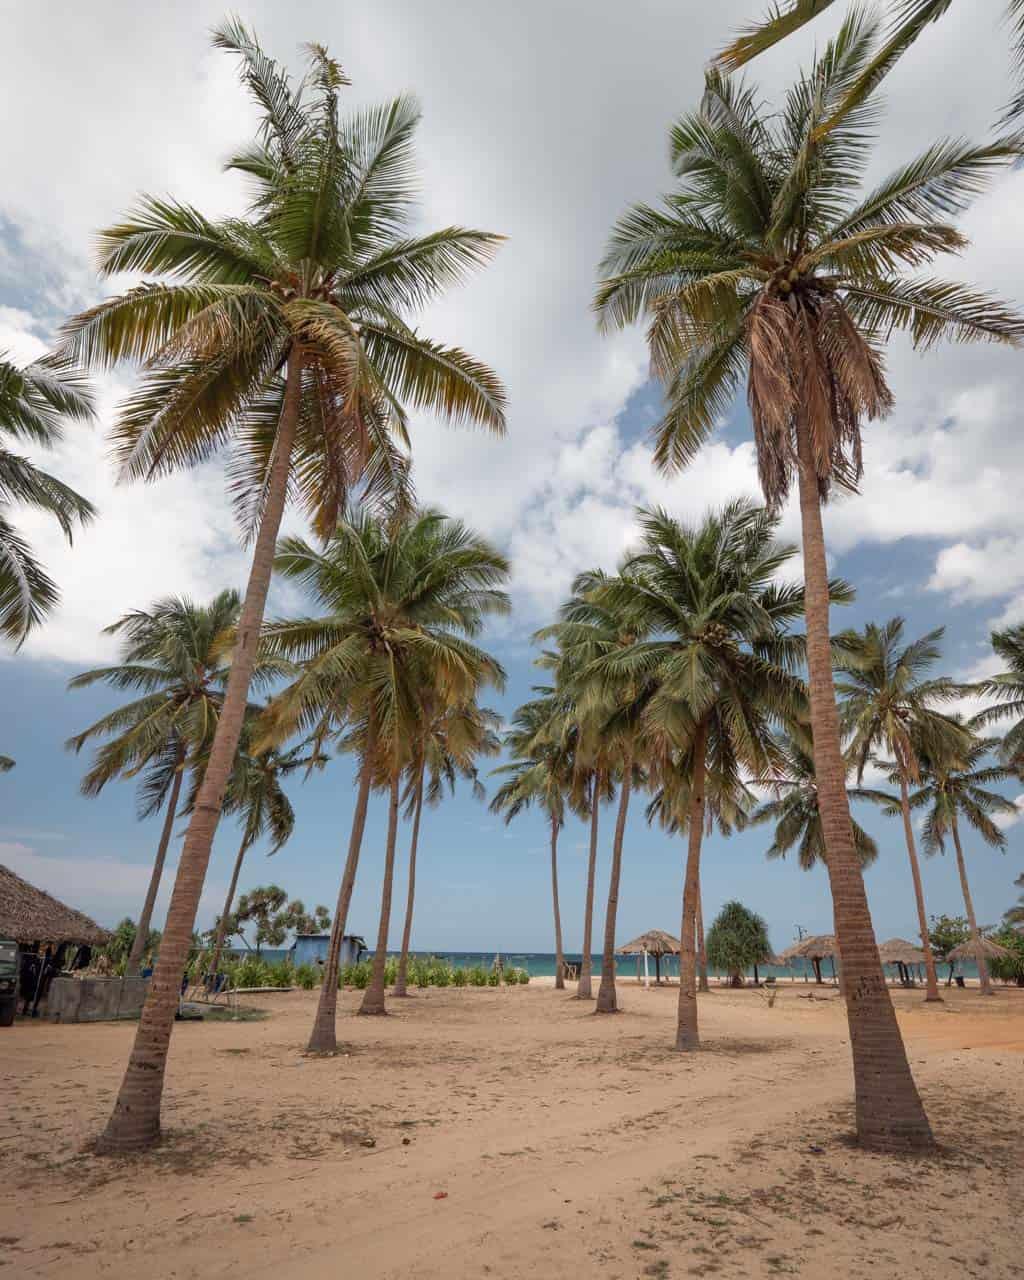 Trincomalee-nilaveli-beach-palmtrees